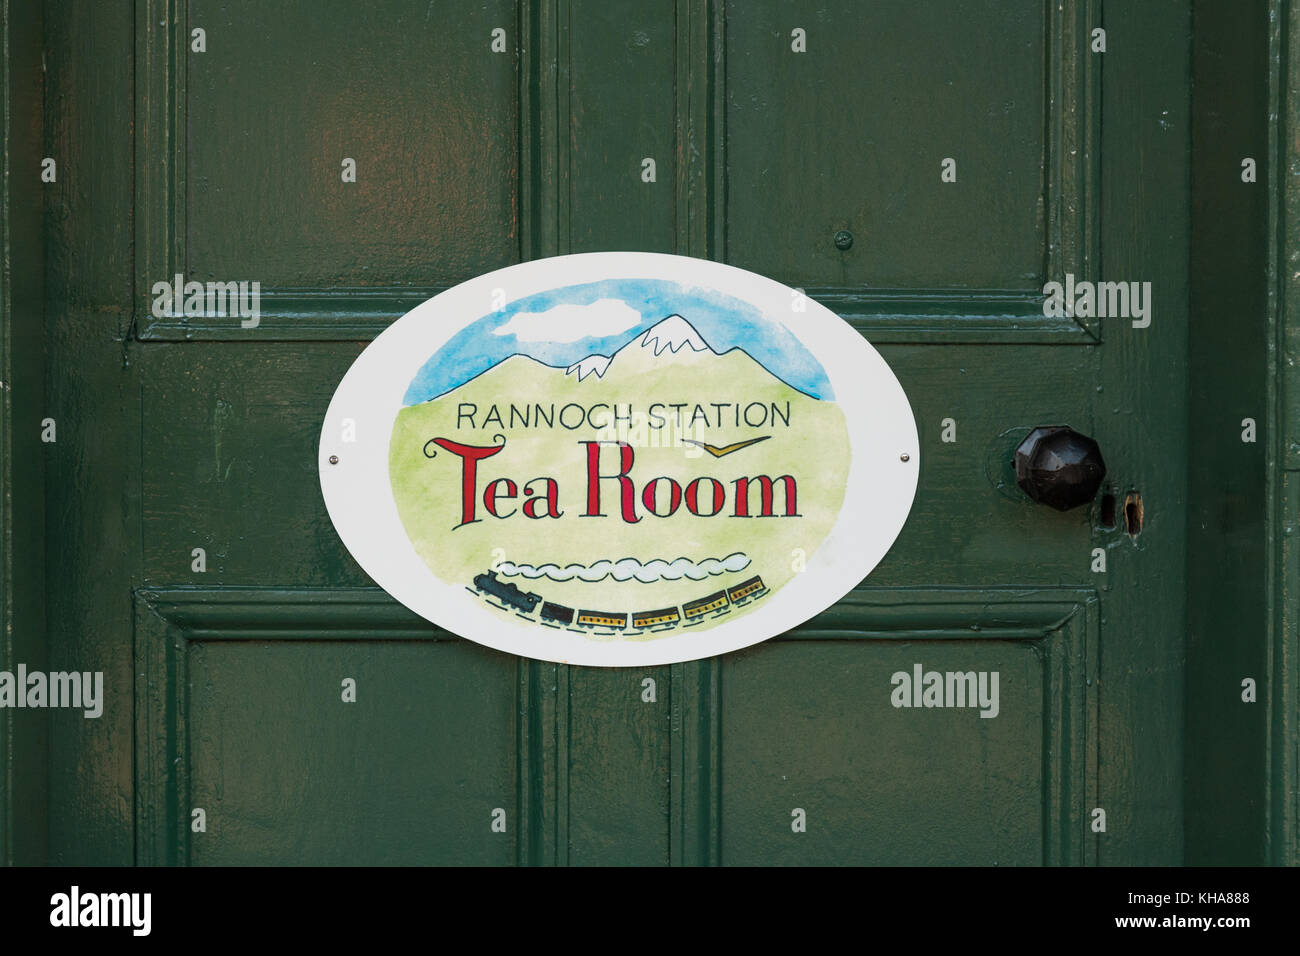 Rannoch Station Tea Room sign, Rannoch Moor, Perth and Kinross, Scotland, UK - Stock Image